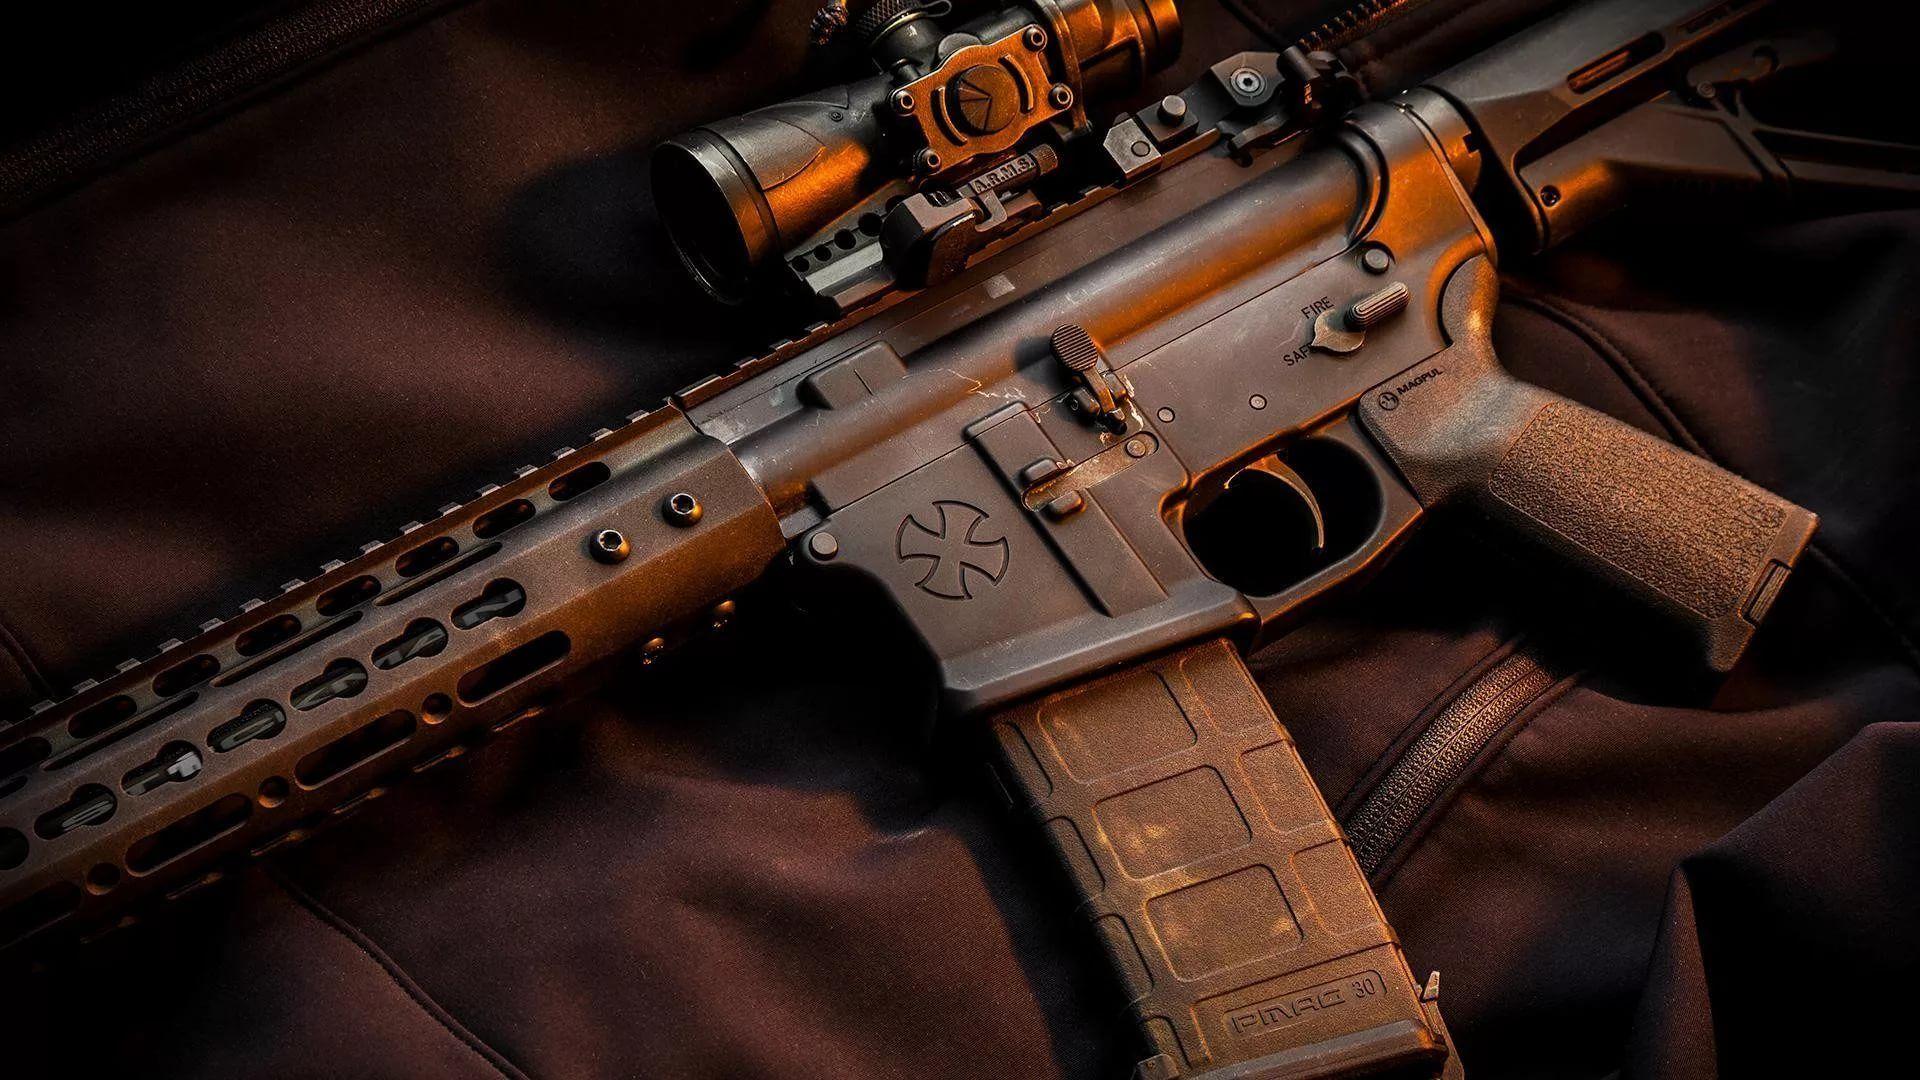 Gun For Desktop Wallpaper Picture